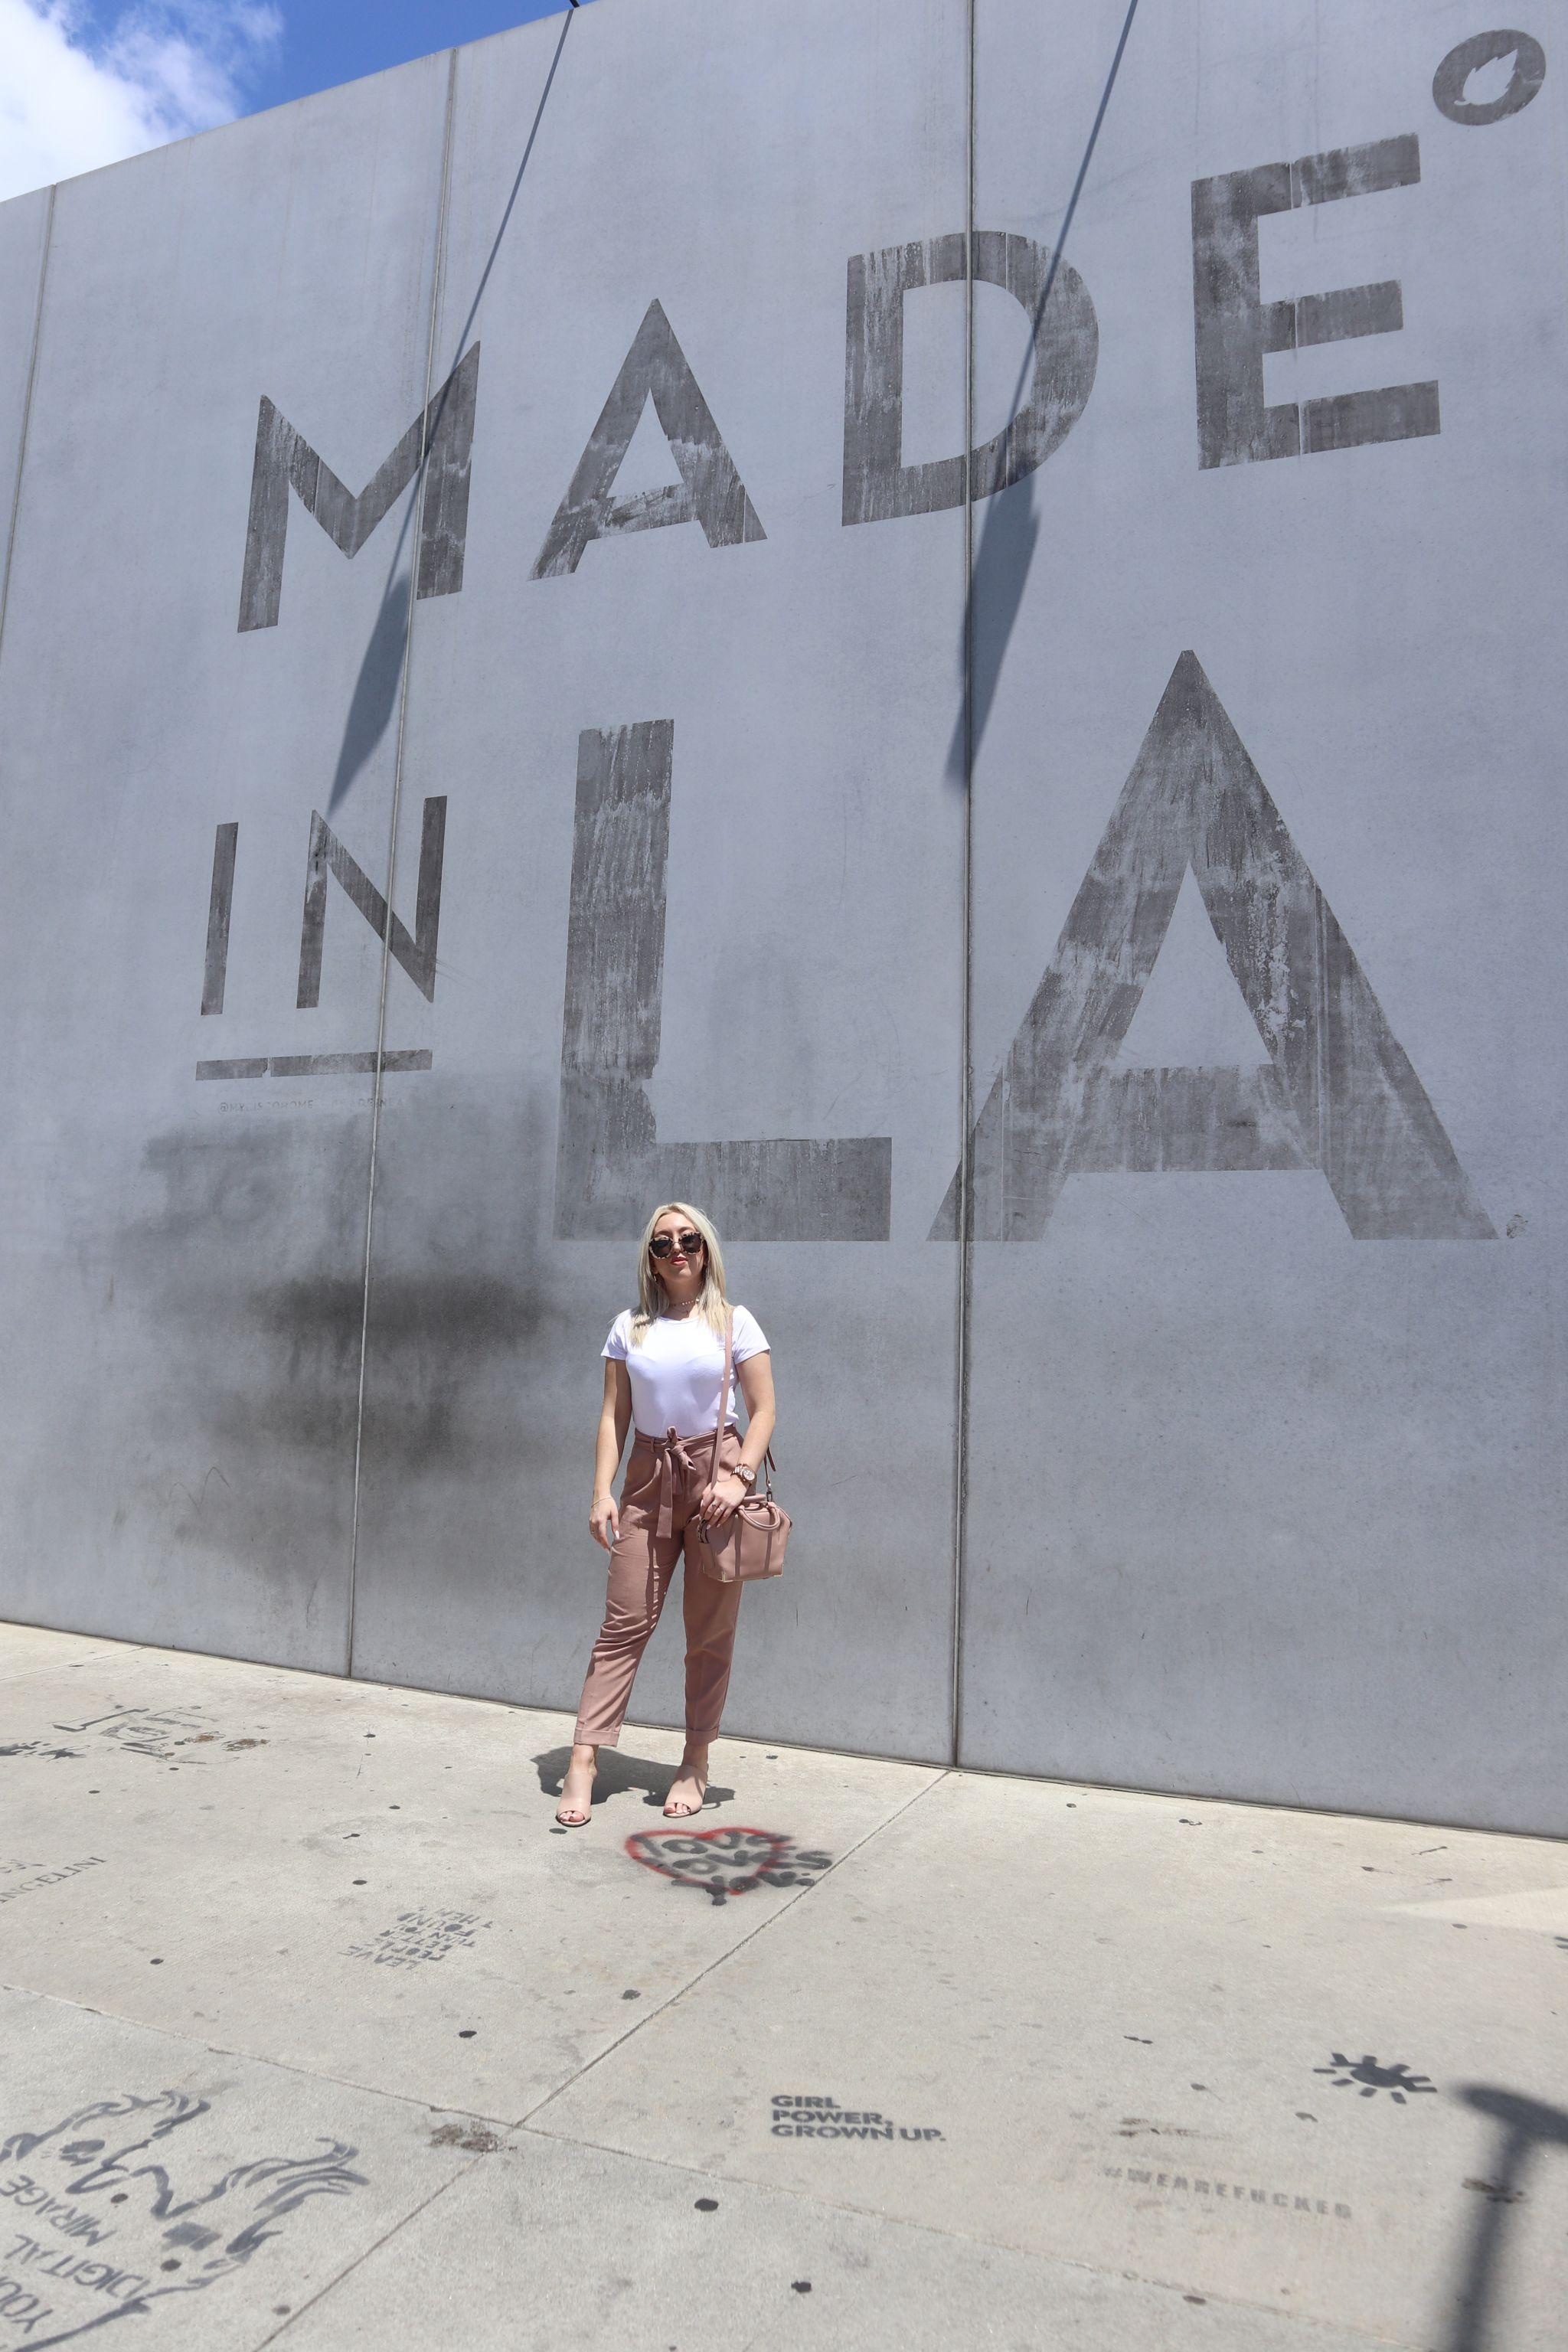 LA Instagram Hotspot Guide